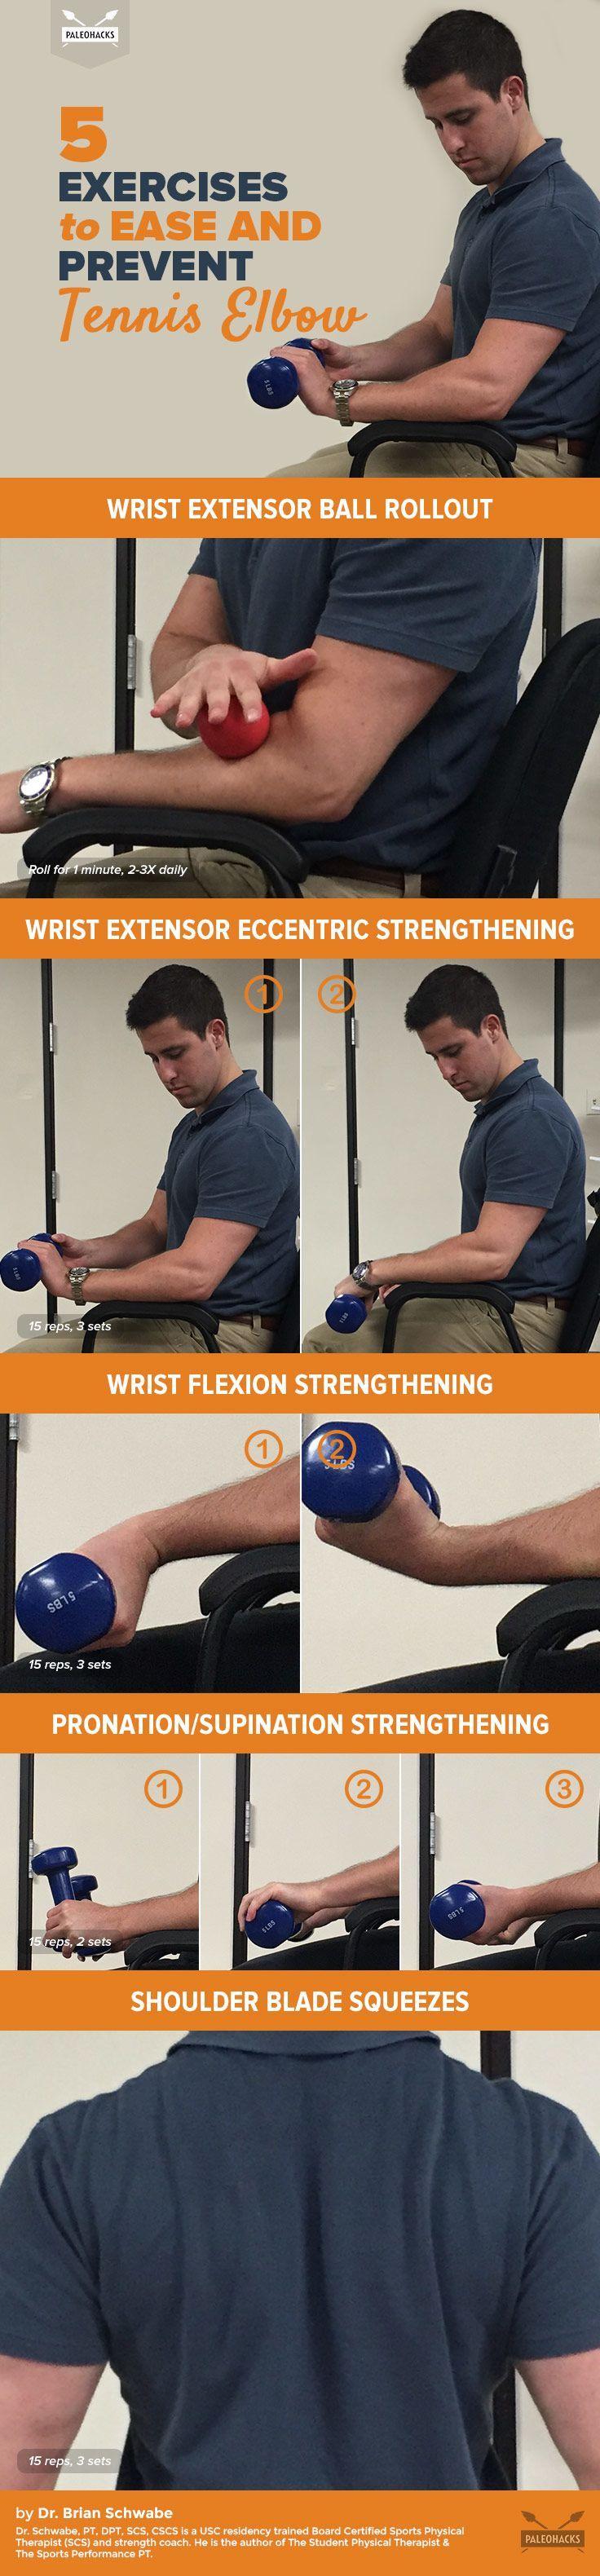 5 Exercises To Treat Tennis Elbow In 2020 Tennis Elbow Elbow Exercises Tennis Elbow Exercises